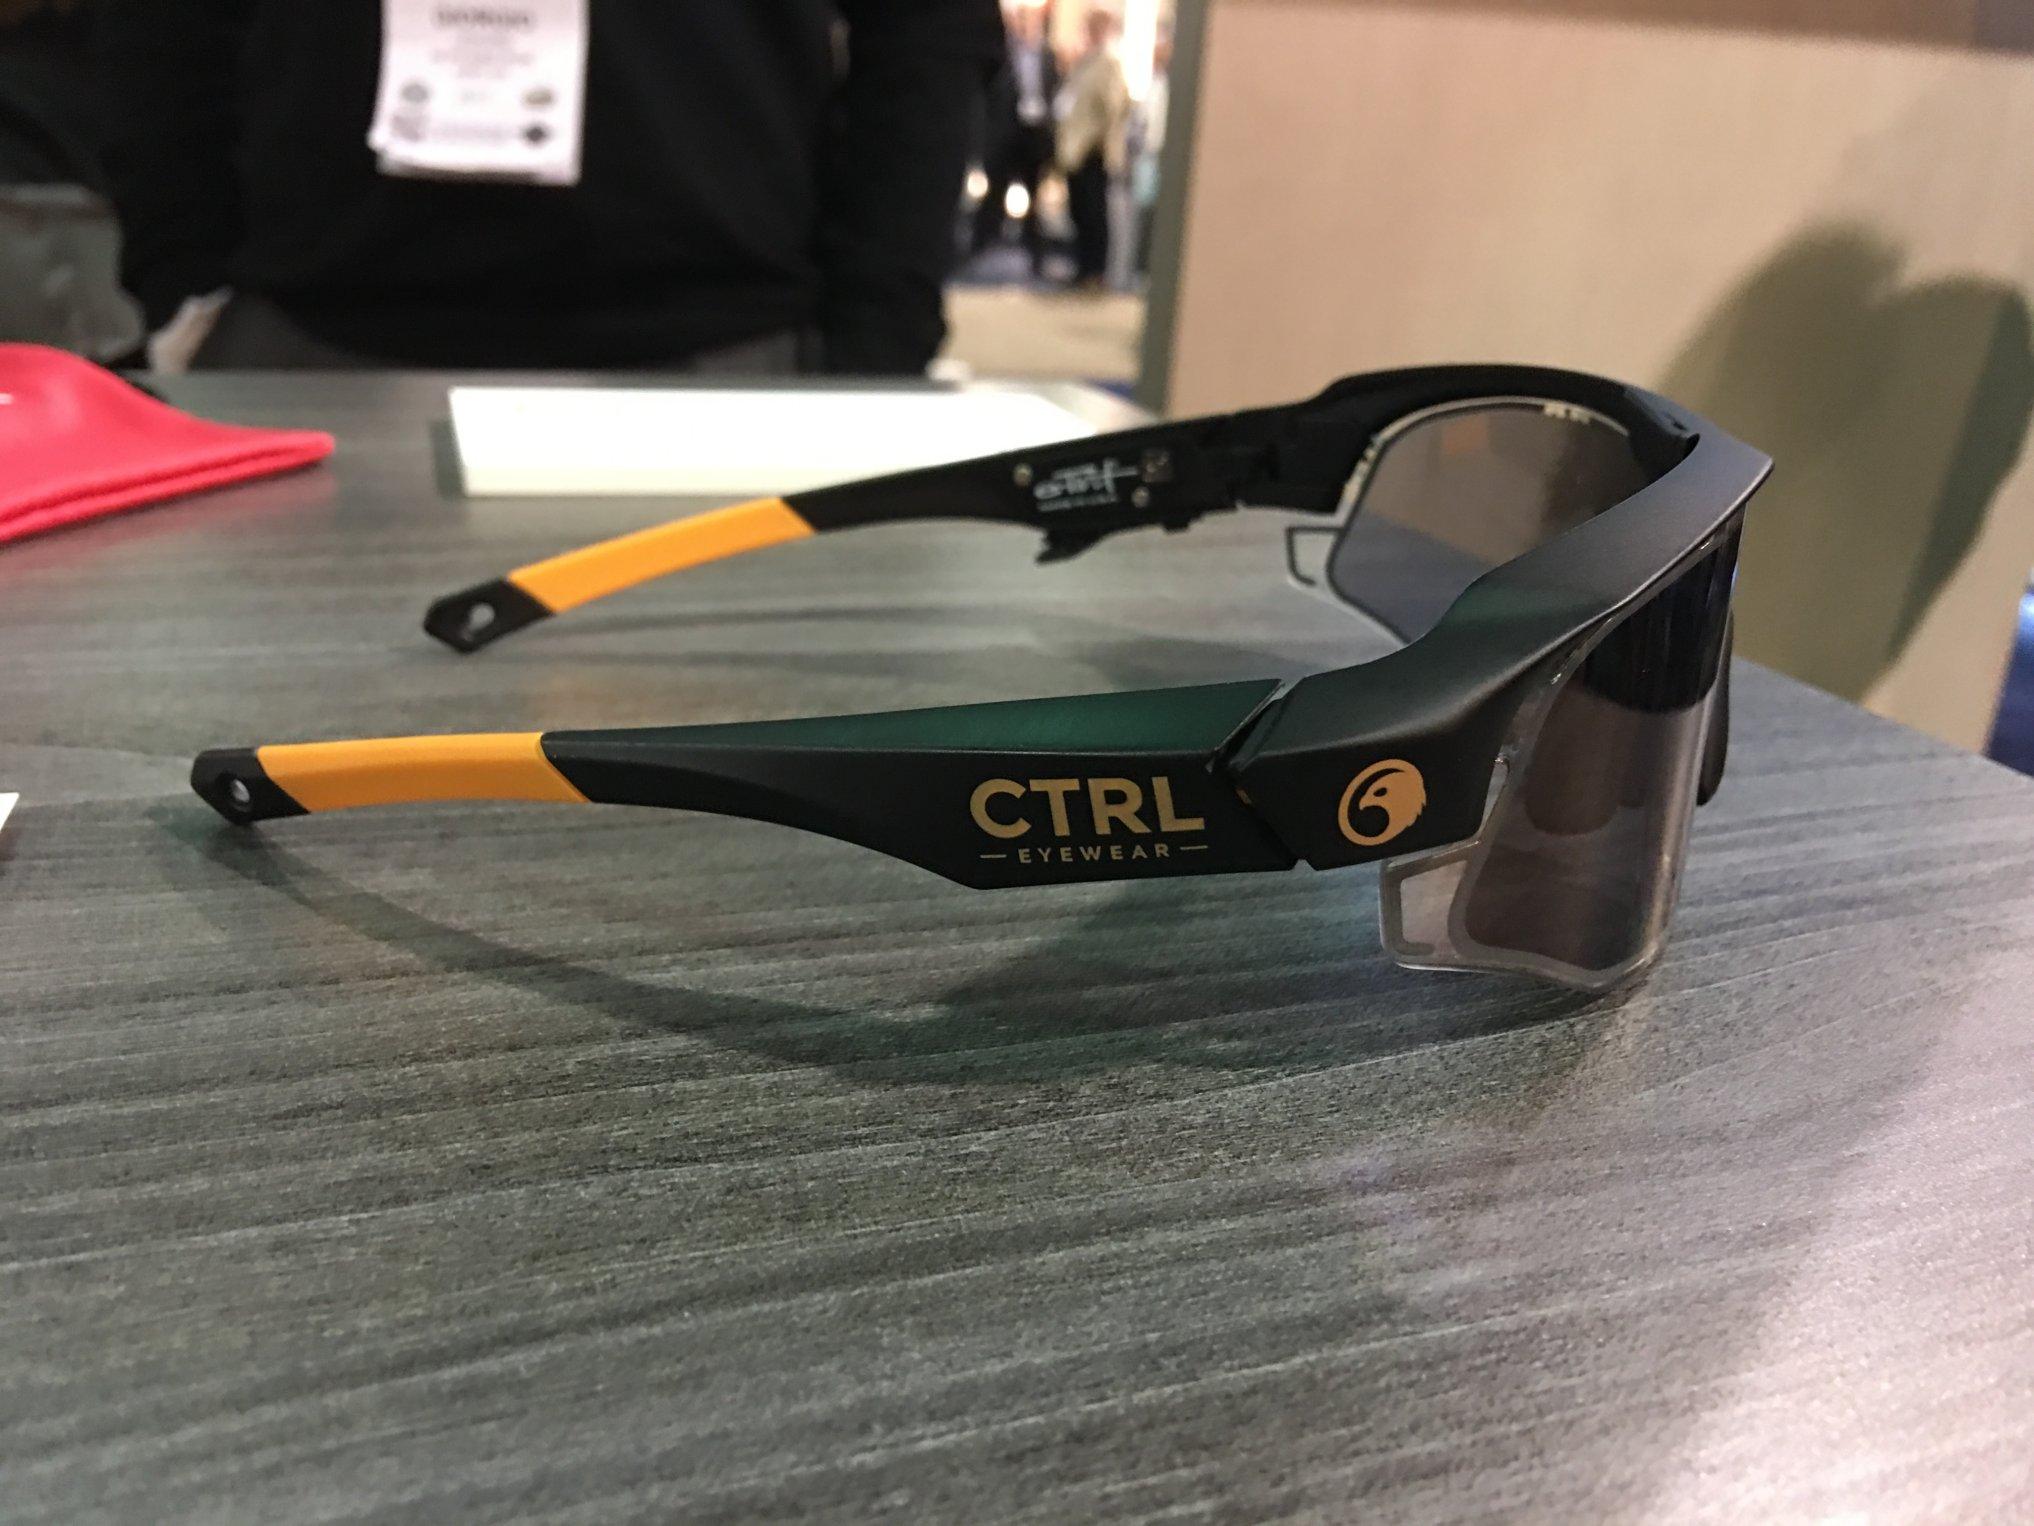 378f018de4c Beretta Protection Technology (BPT) CTRL Eyewear B-On Electronic ...